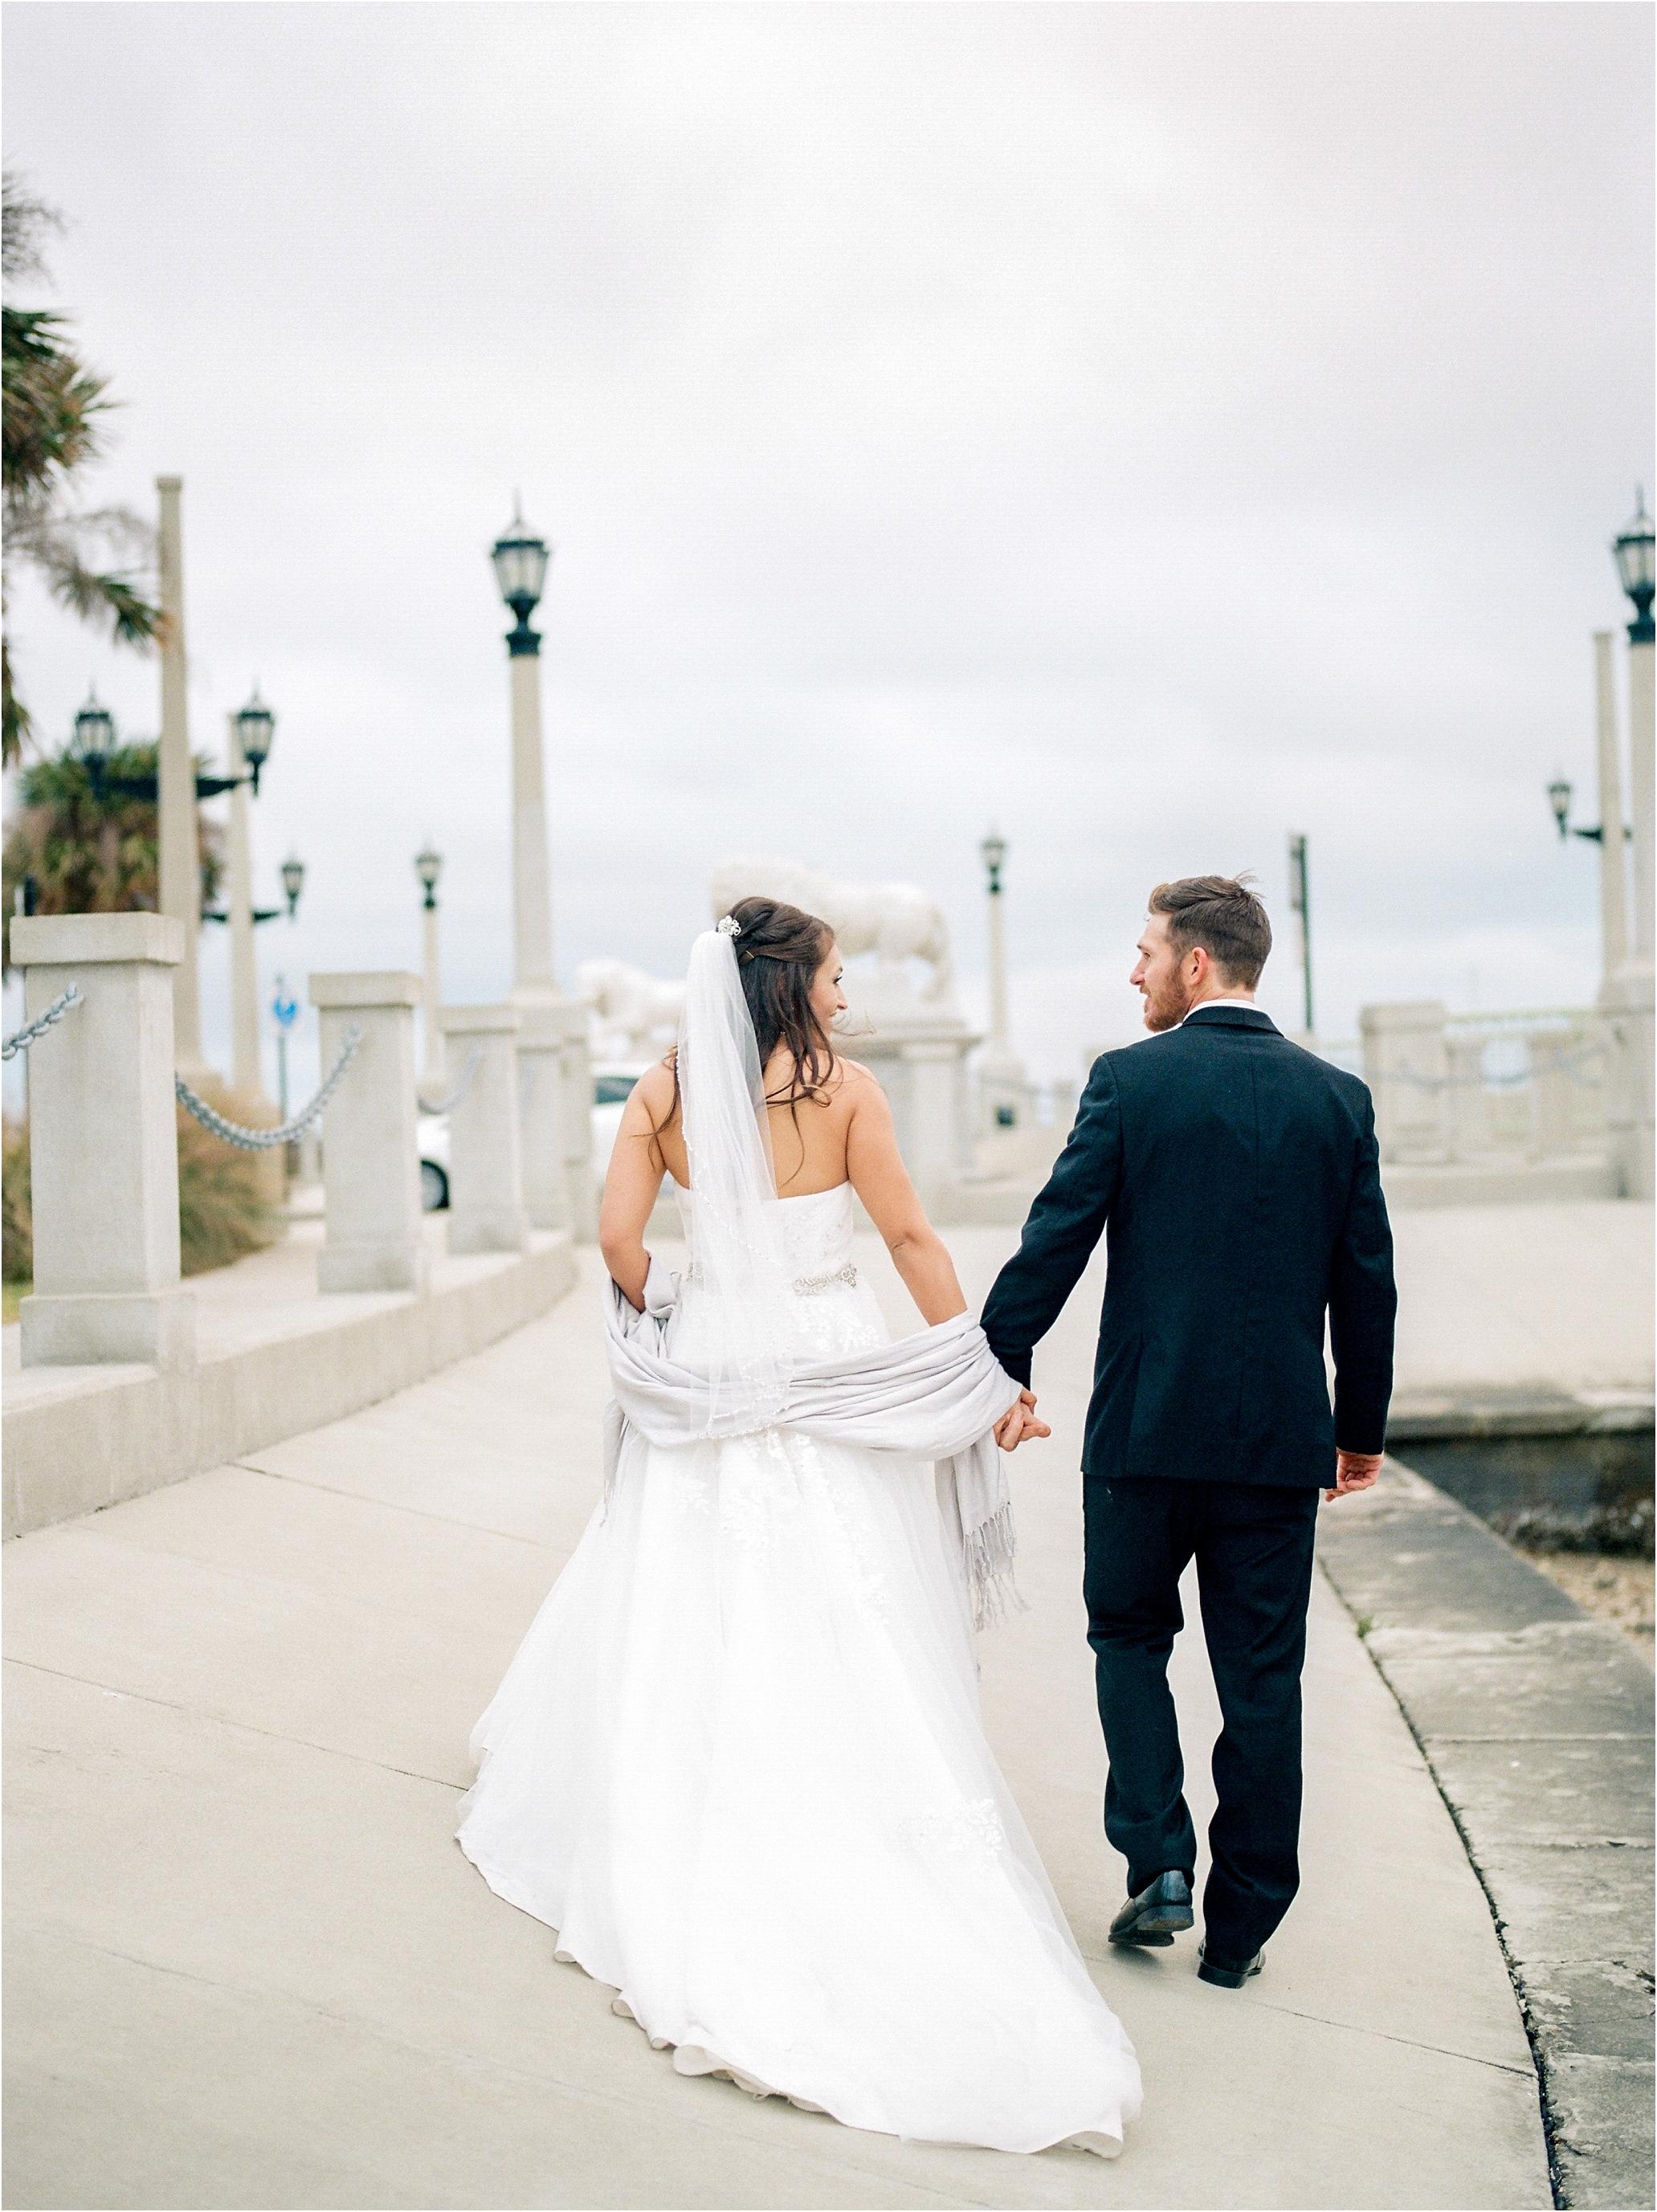 Lisa Silva Photography- Ponte Vedra Beach and Jacksonville, Florida Fine Art Film Wedding Photography- Wedding at The White Room Villa Blanca in St. Augustine, Florida_0060.jpg